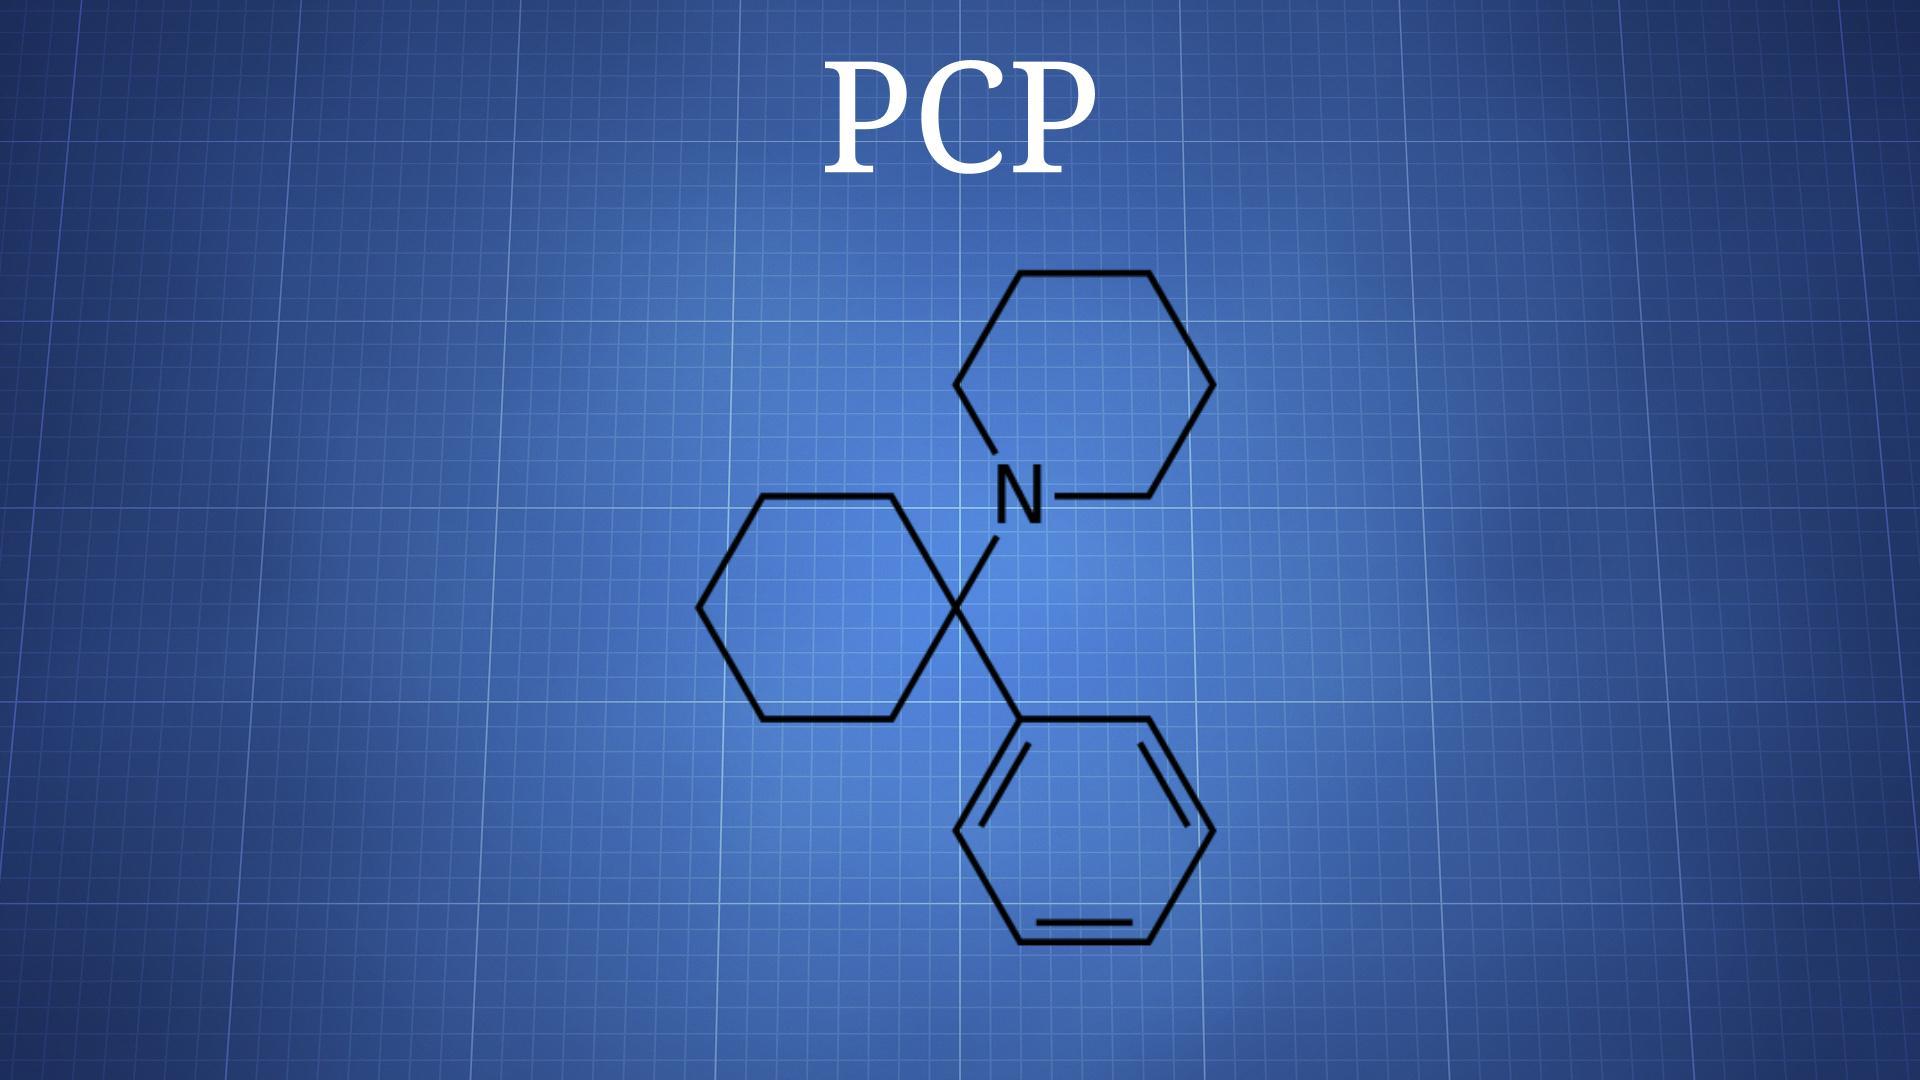 Phencyclidine (PCP) - The Drug Classroom